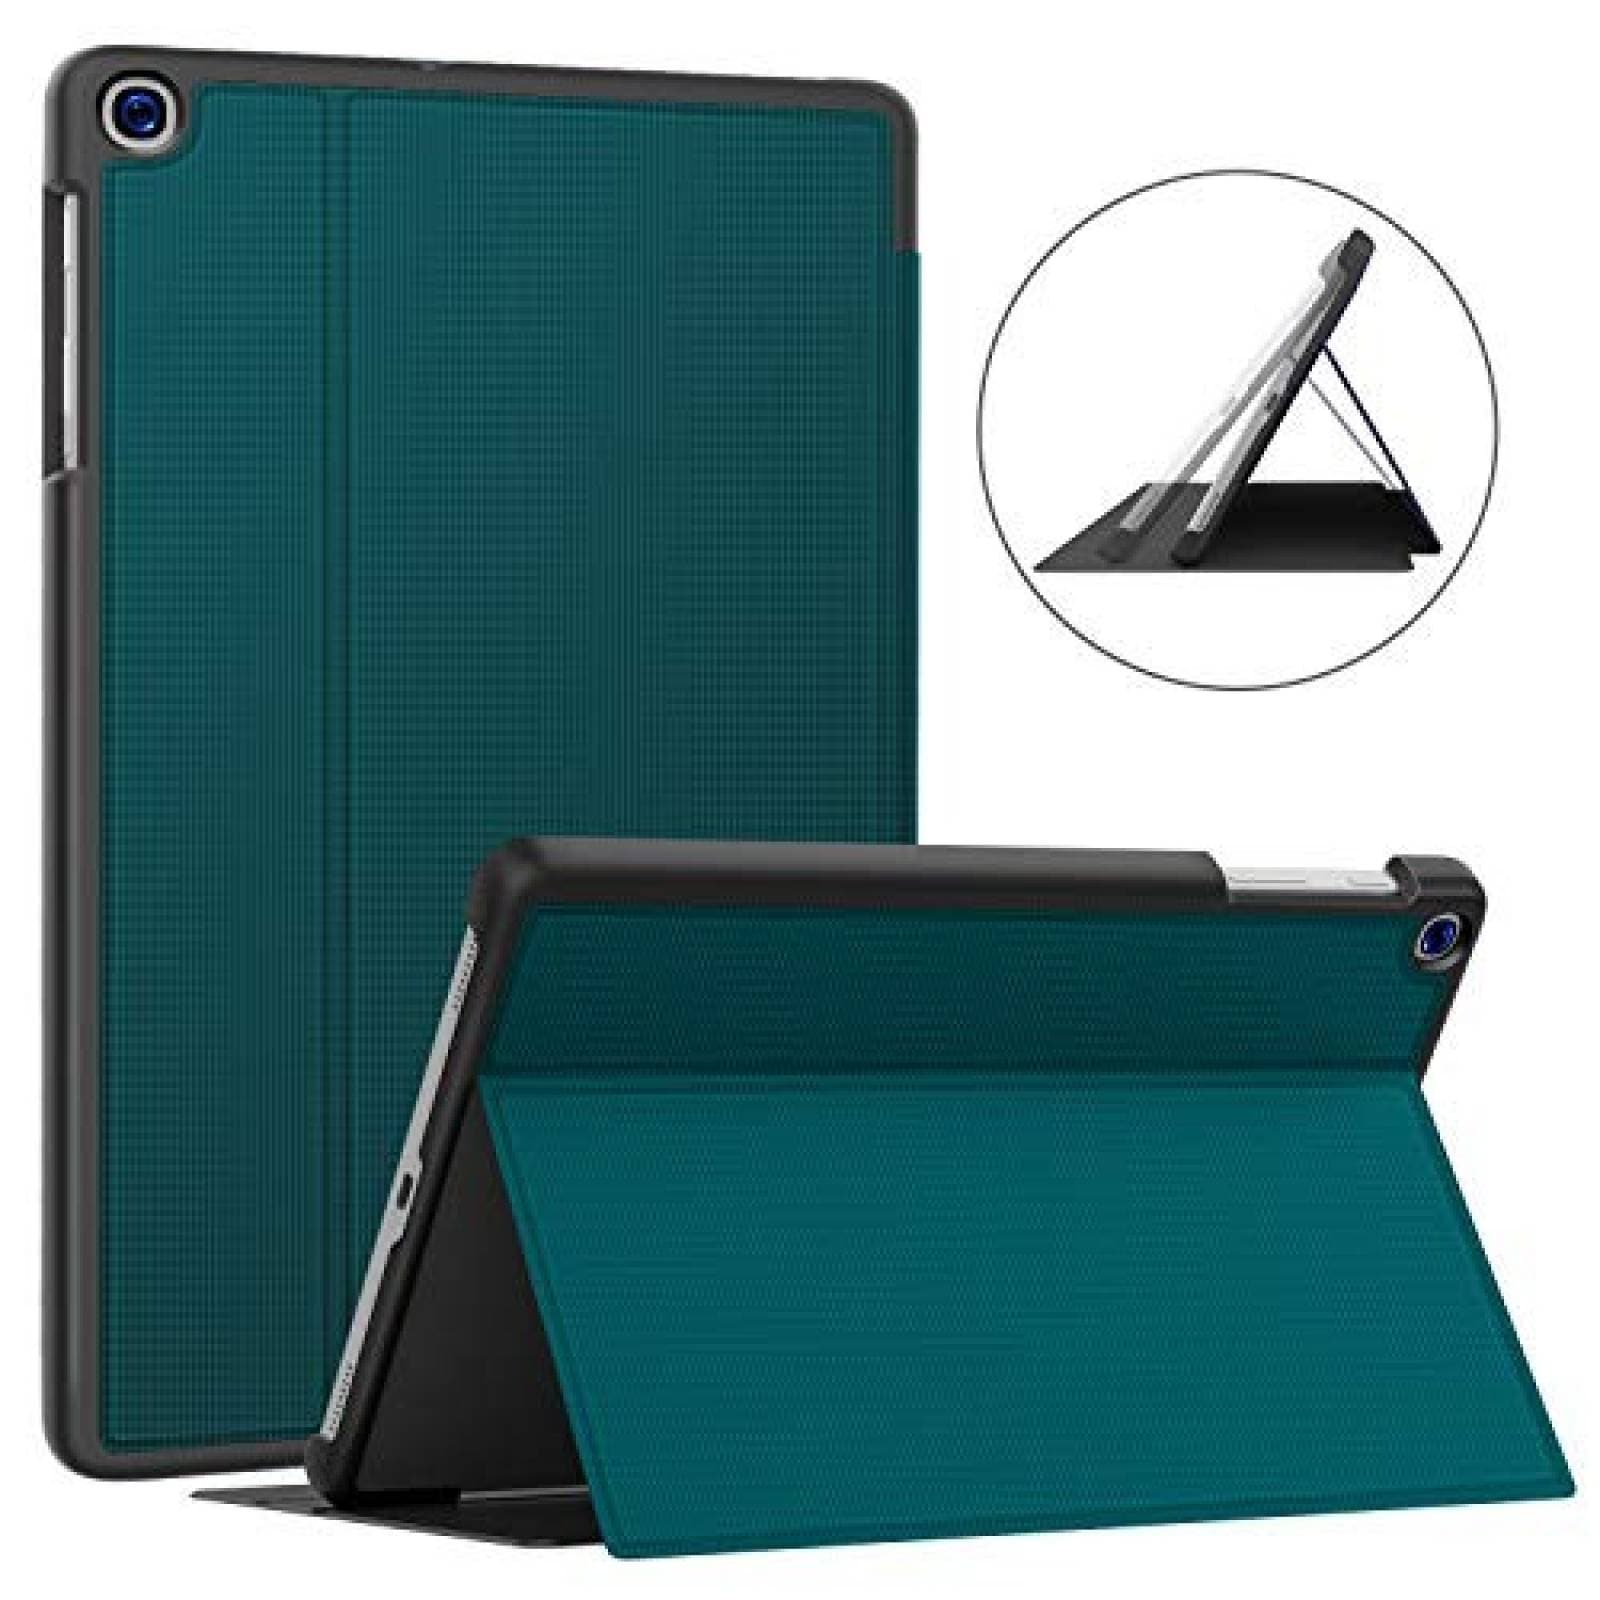 "Funda Soke Galaxy Tab A 10.1"" de TPU -Verde Azulado"